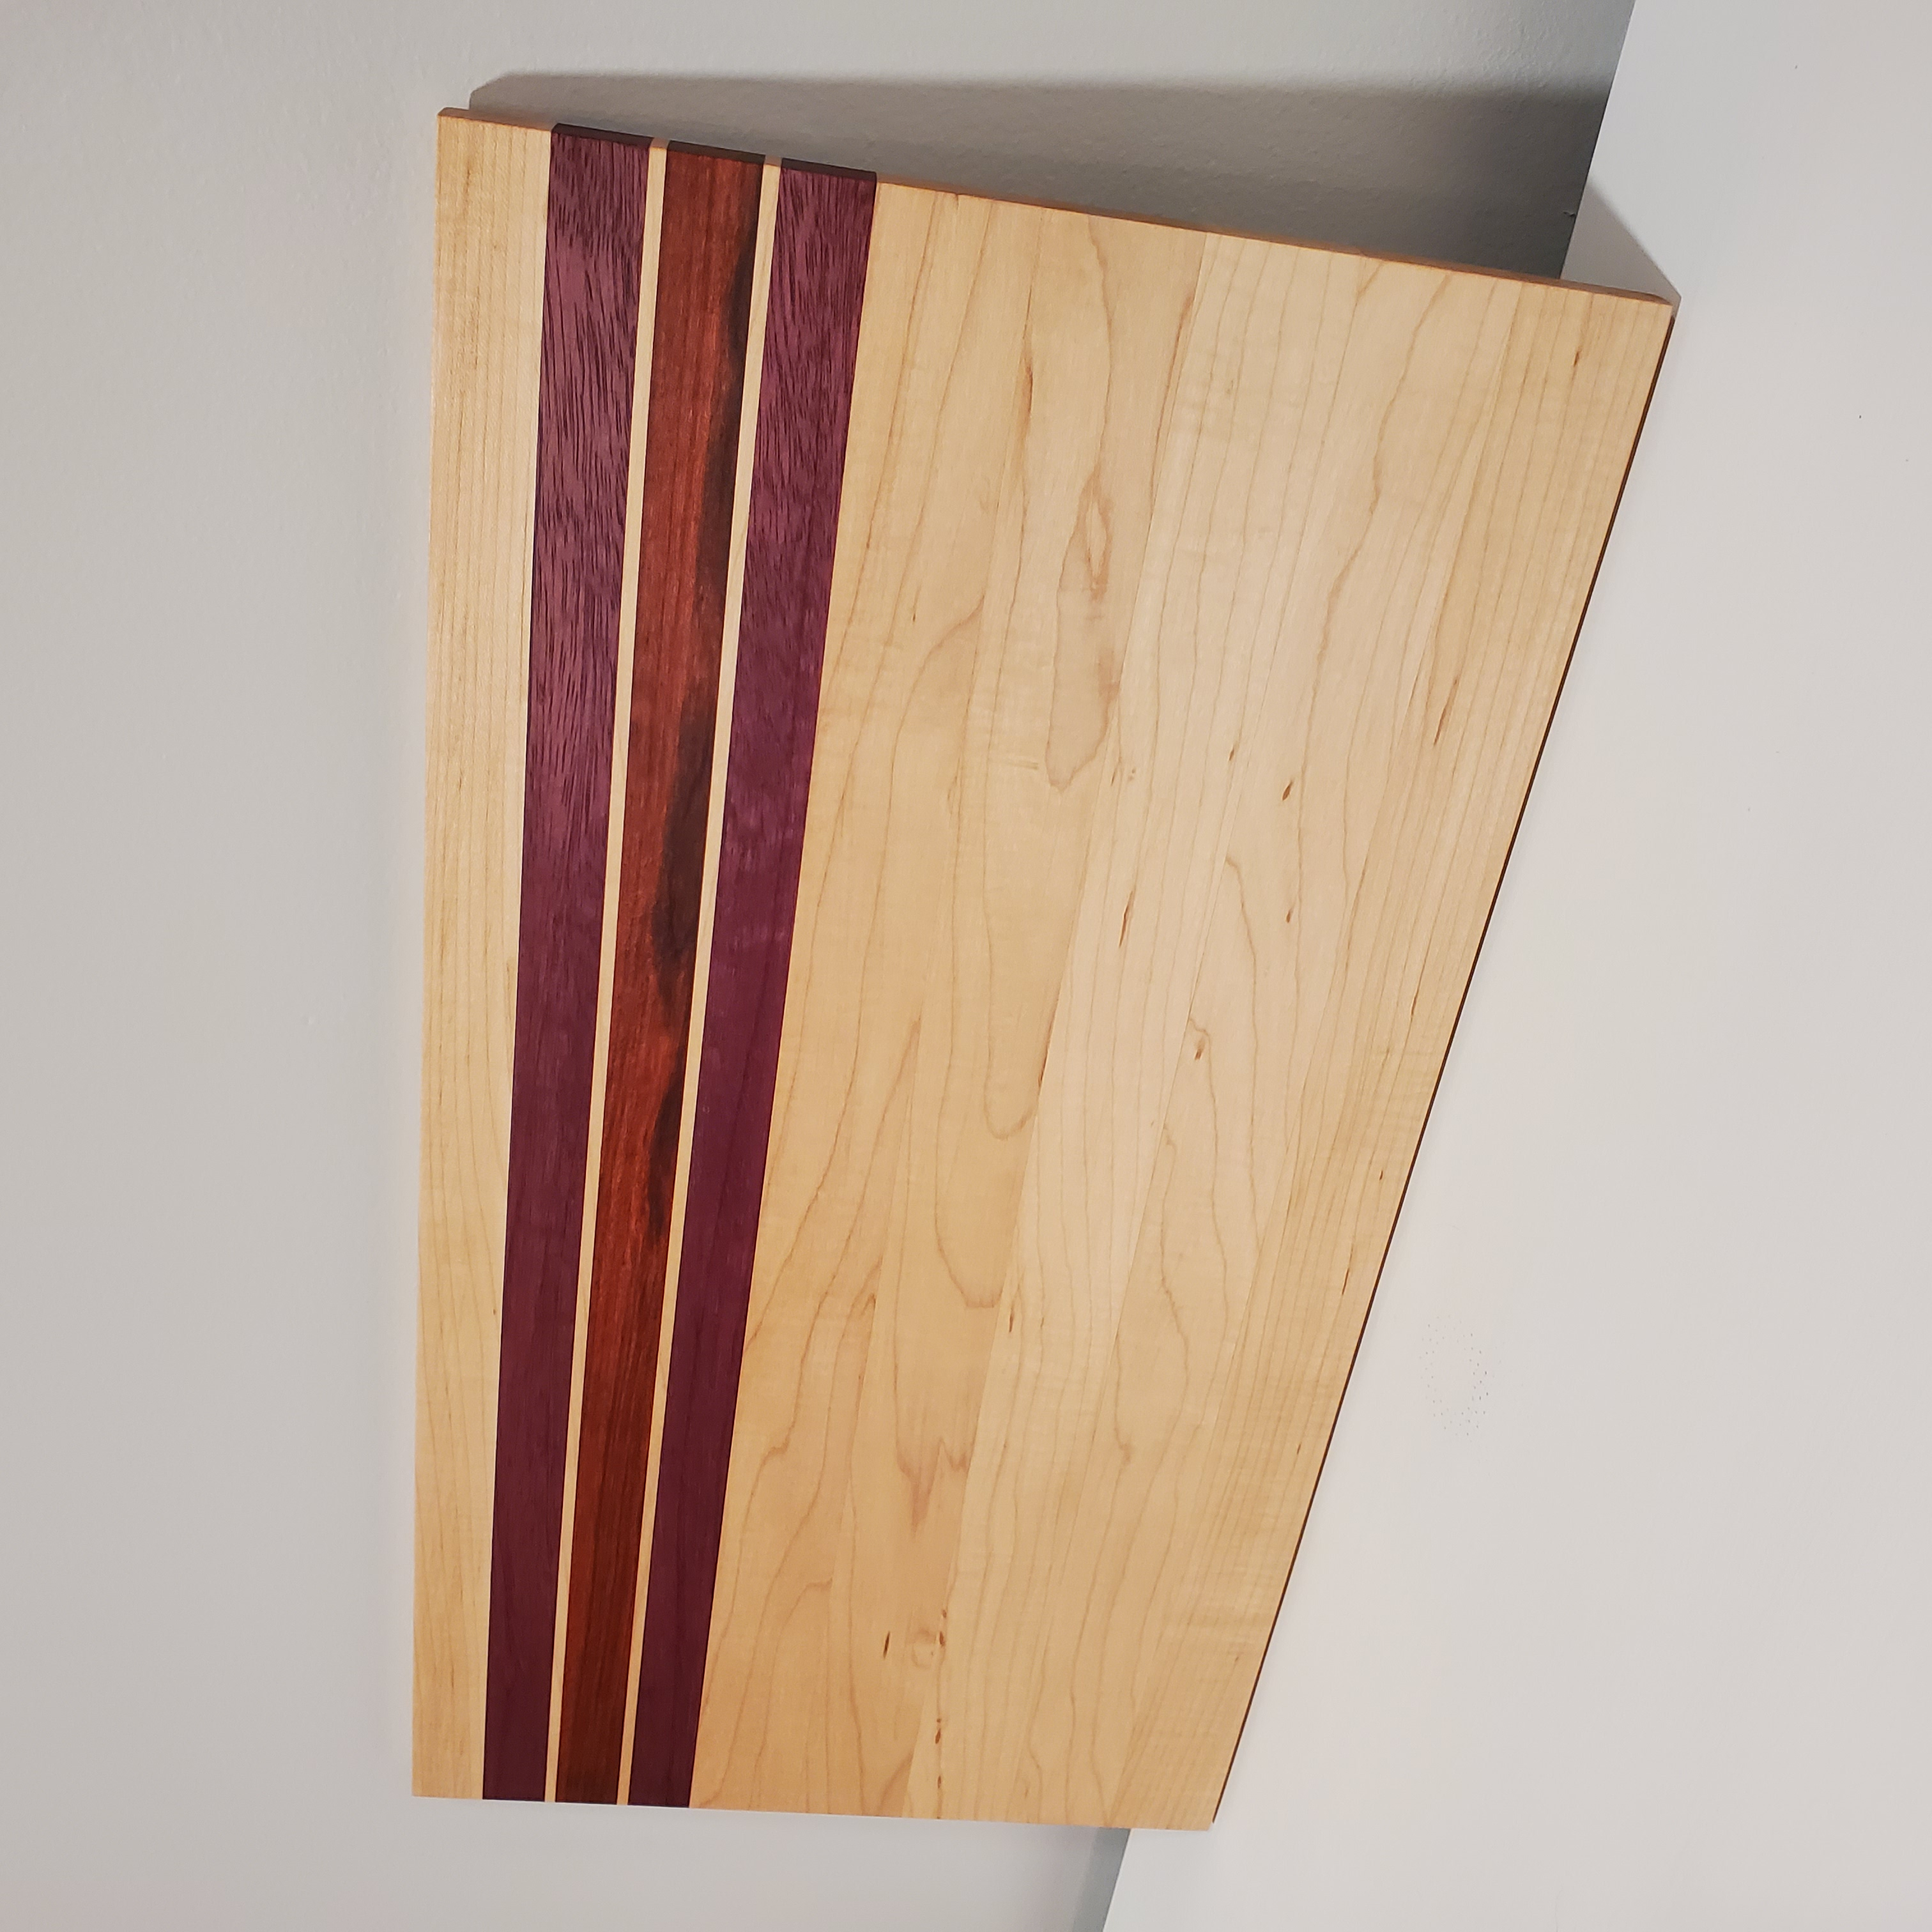 Cutting Board - Maple, Redheart and Purpleheart